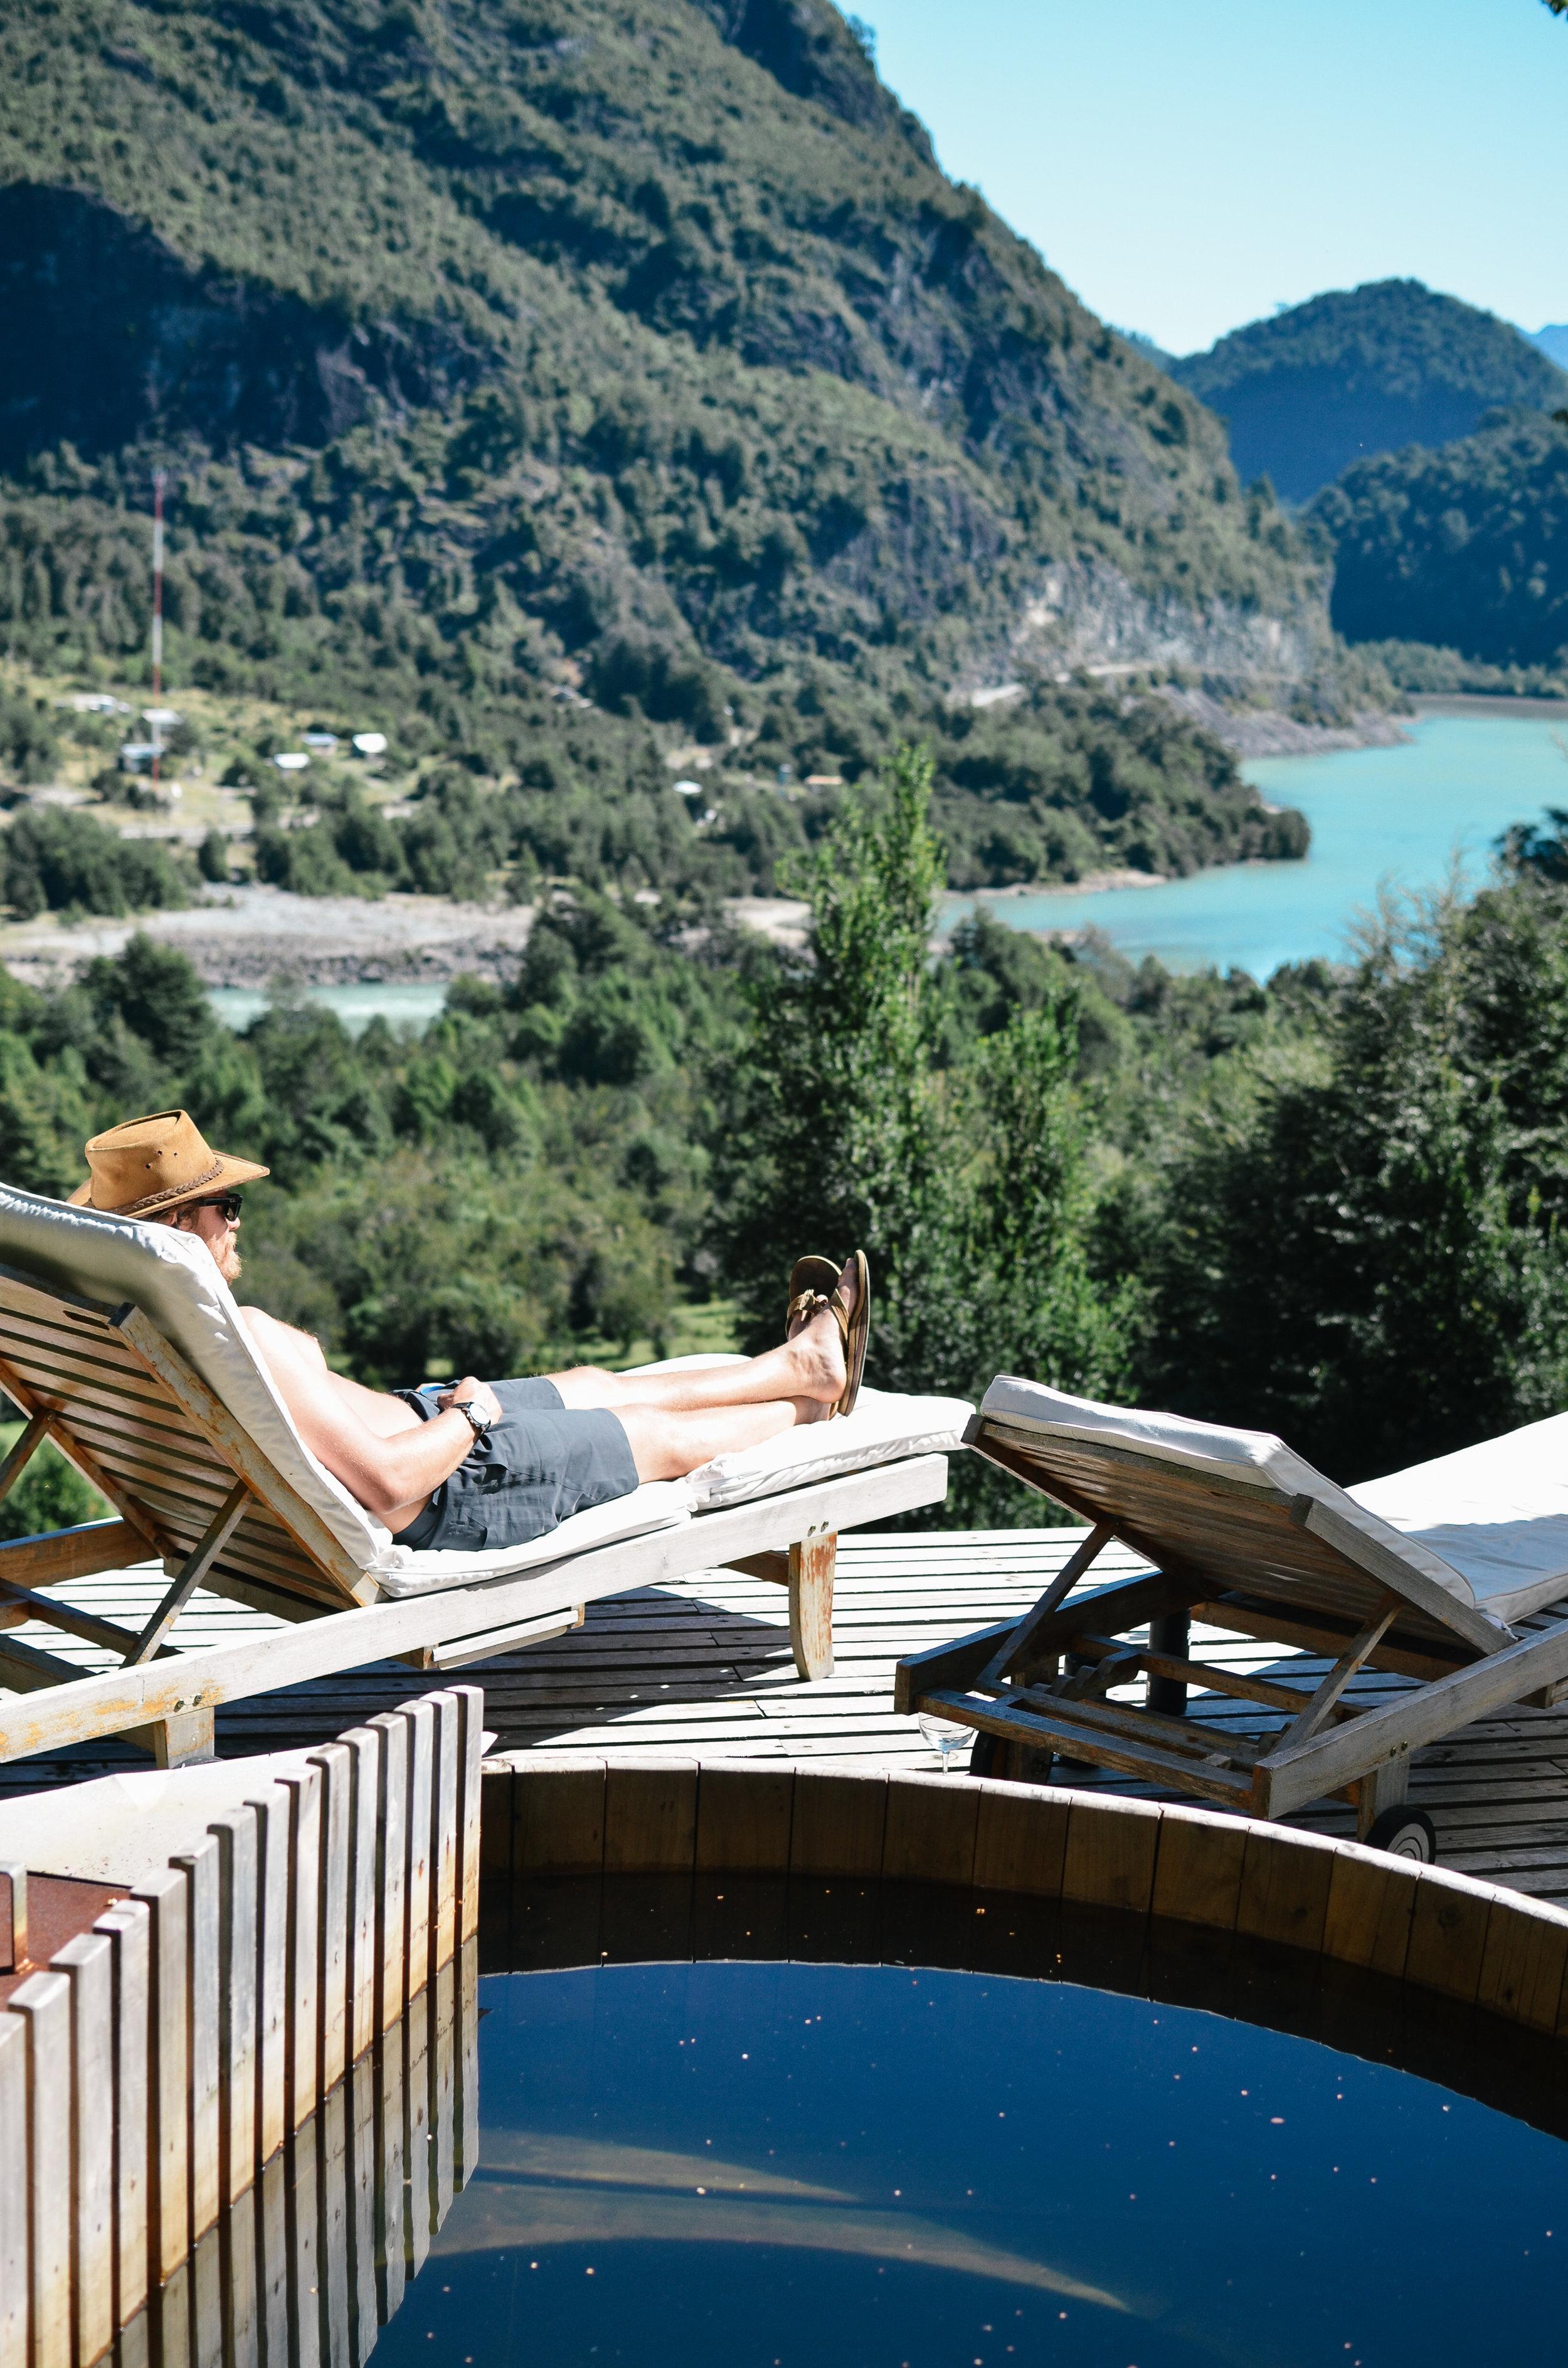 barraco+lodge+chile+life+on+pine+travel+blog+life+on+pine_DSC_1543.jpg